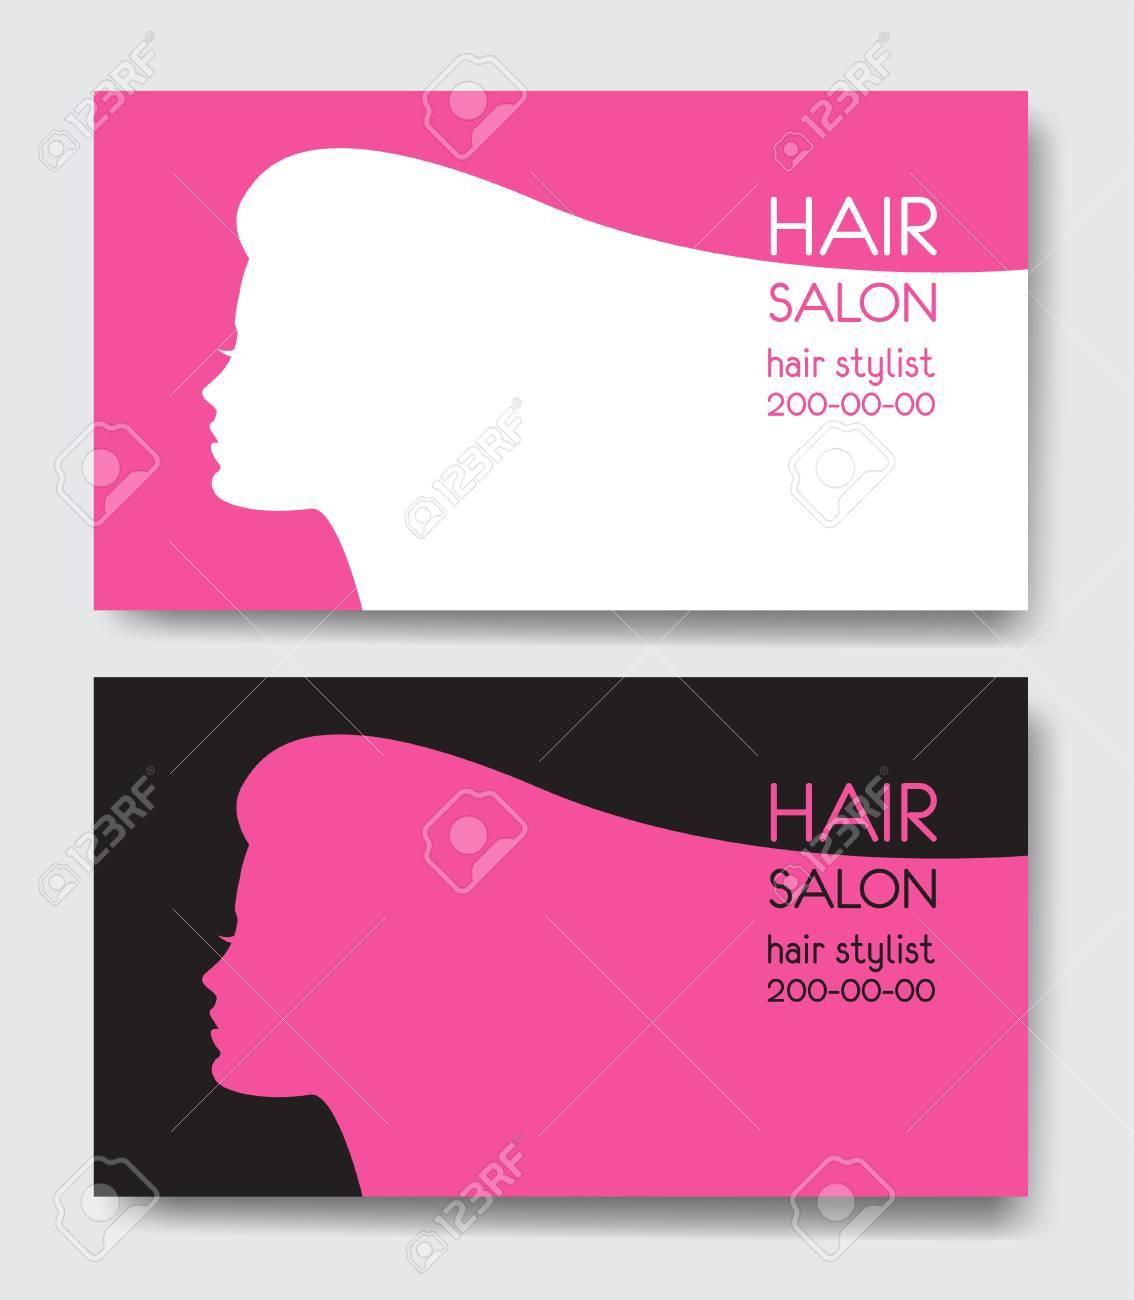 Hair Salon Business Card Templates Royalty Free Cliparts Vectors